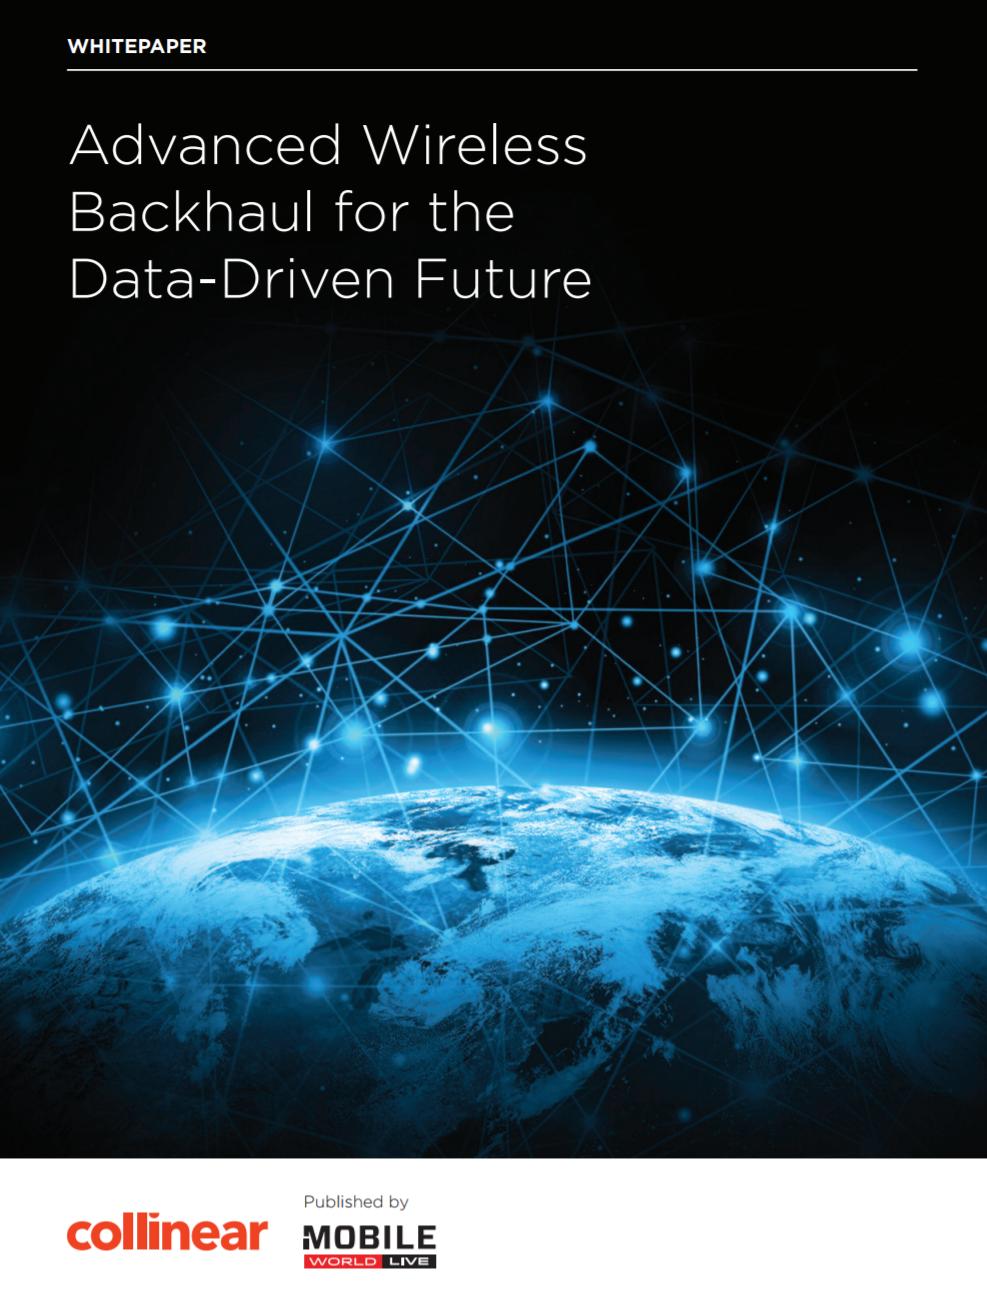 Advanced wireless backhaul for the data-driven future